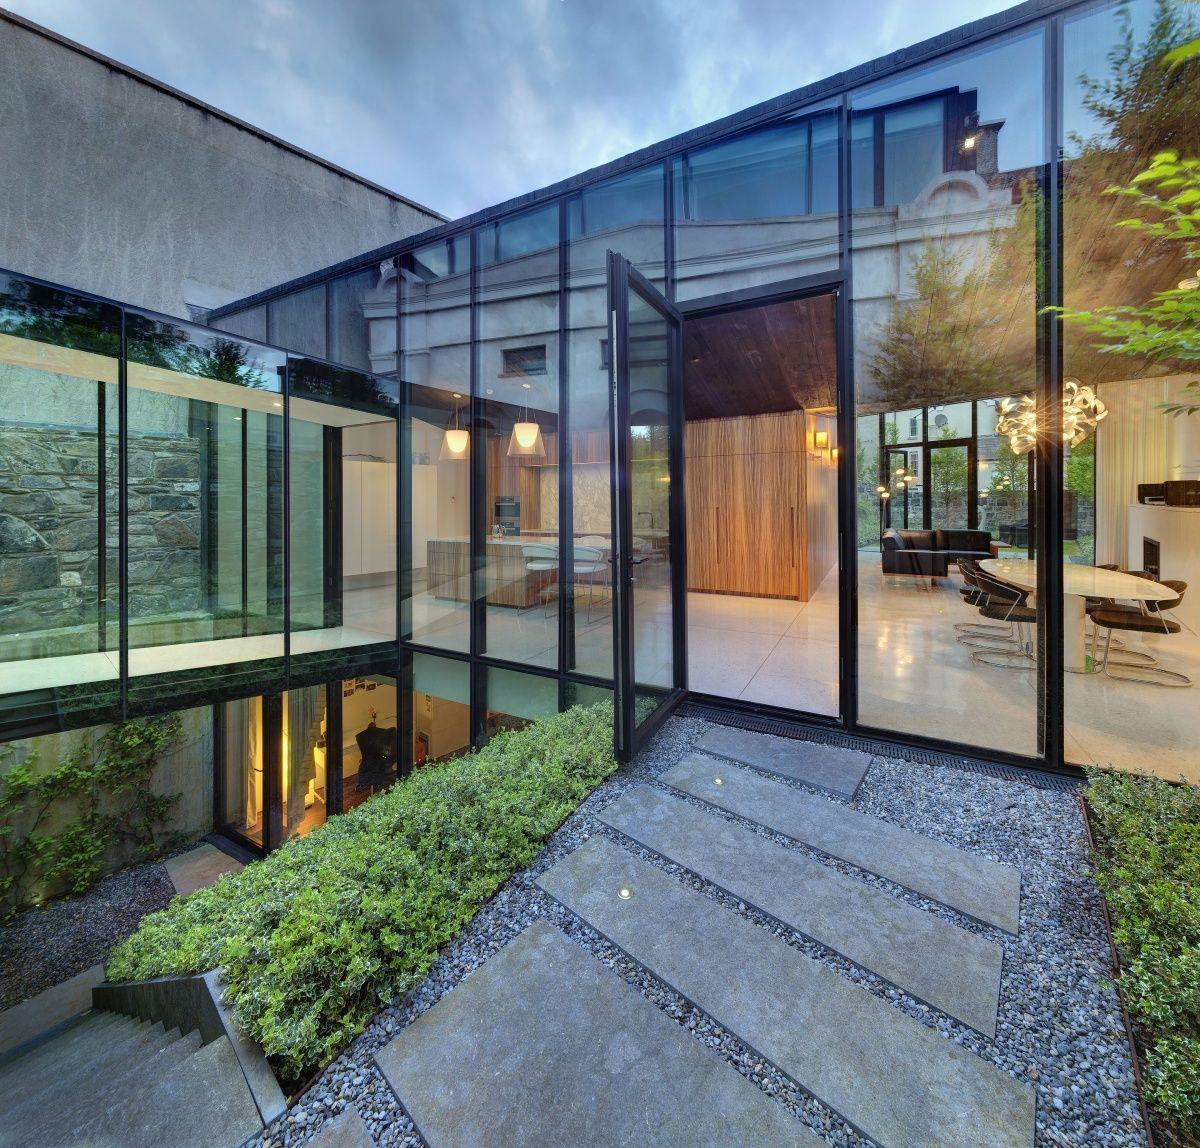 Small Spaces Architects Dublin Ireland Houses: LOHA: Lorcan O'Herlihy Architects